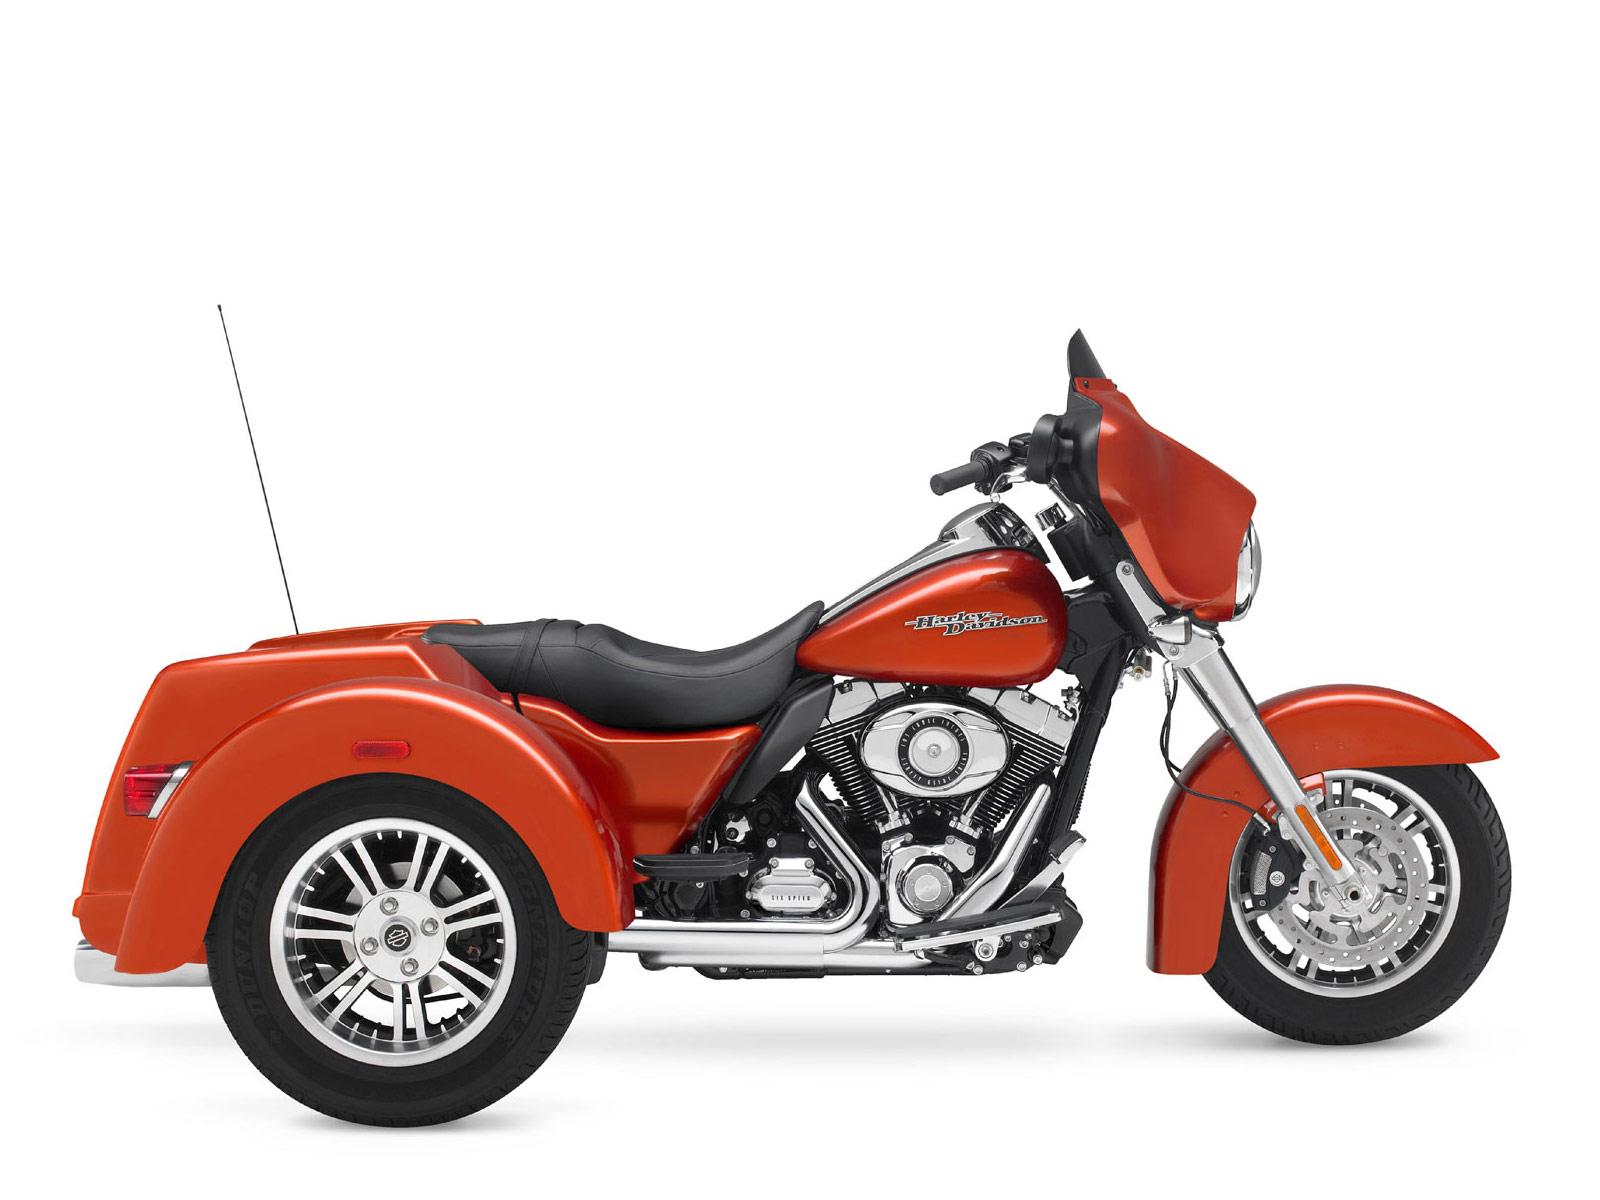 2011 Harley Street Glide Trike